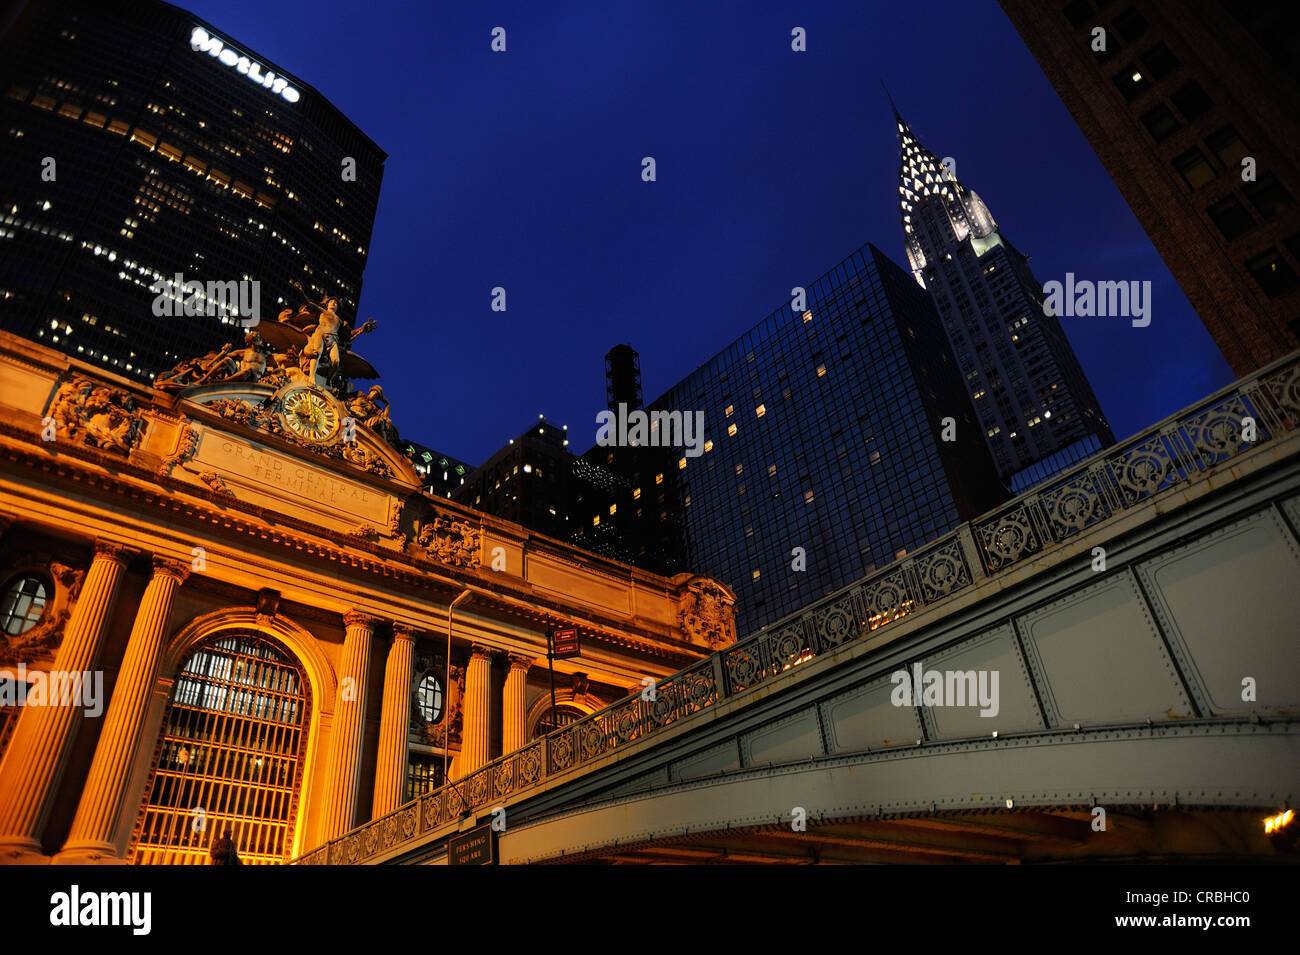 Grand Central Terminal and Chrysler Building, Manhattan, New York, USA - Stock Image